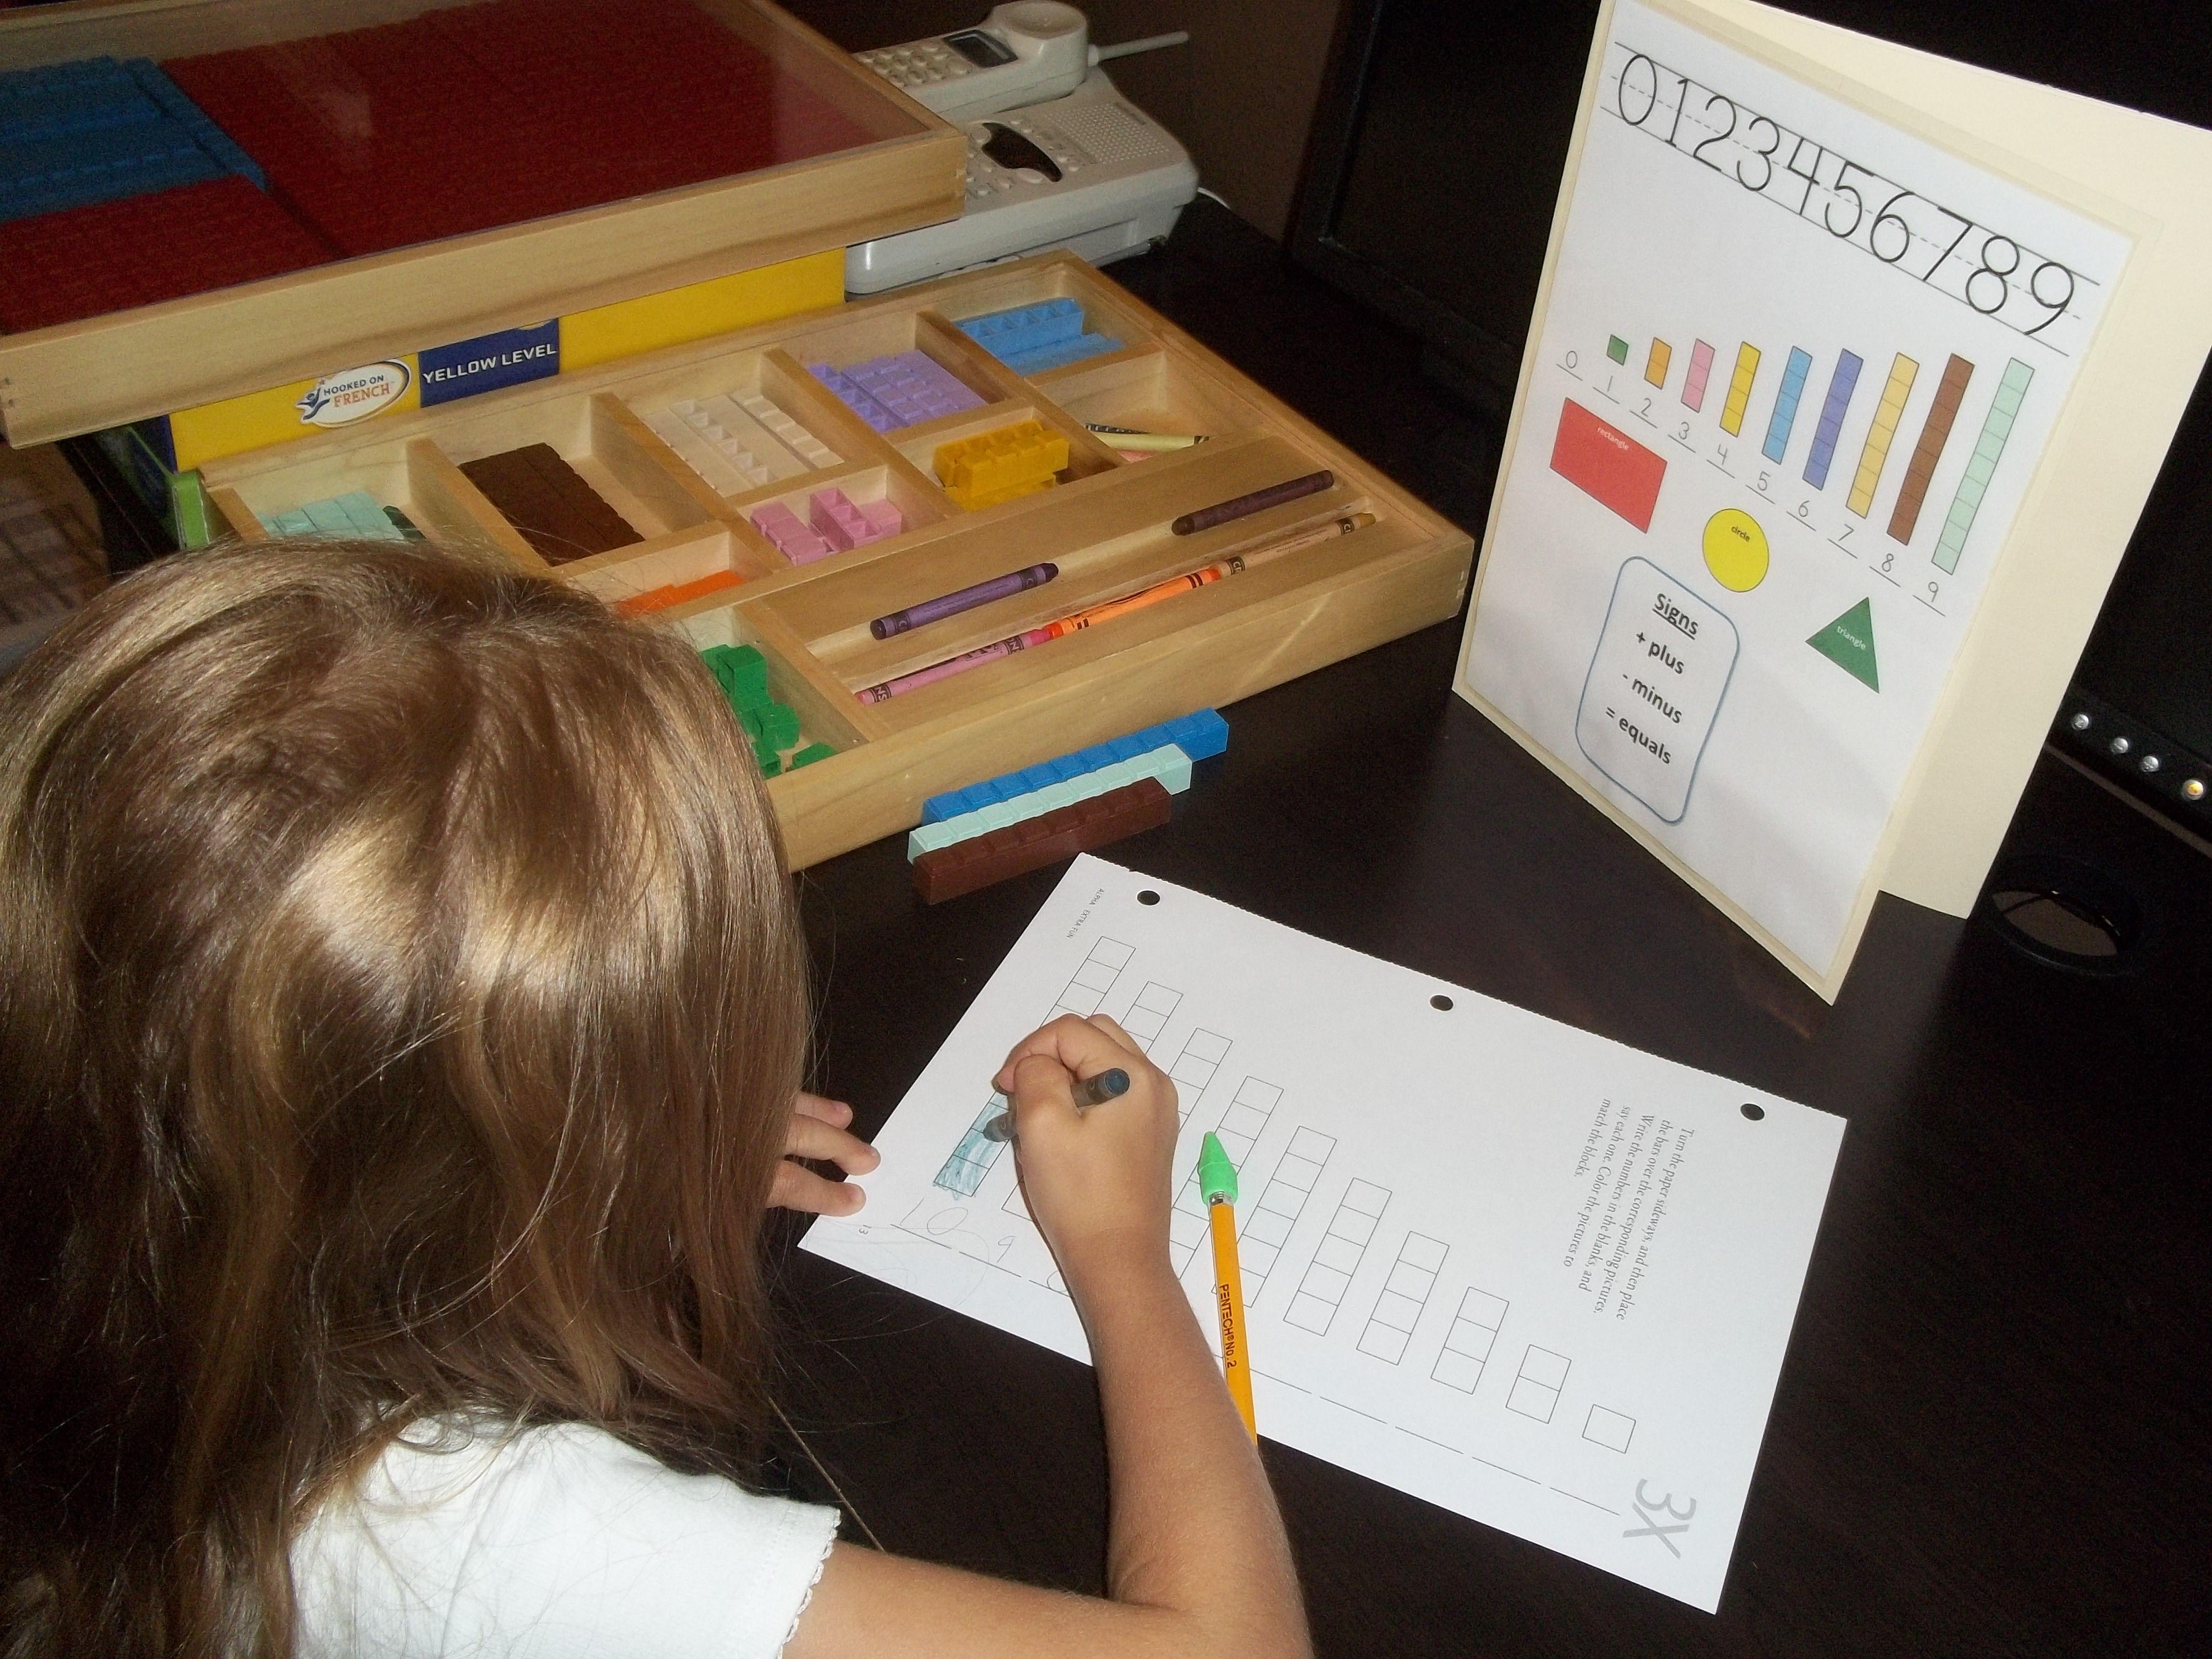 Free Worksheet Math U See Worksheets 17 best ideas about math u see on pinterest multiplication tricks teaching facts and kids math